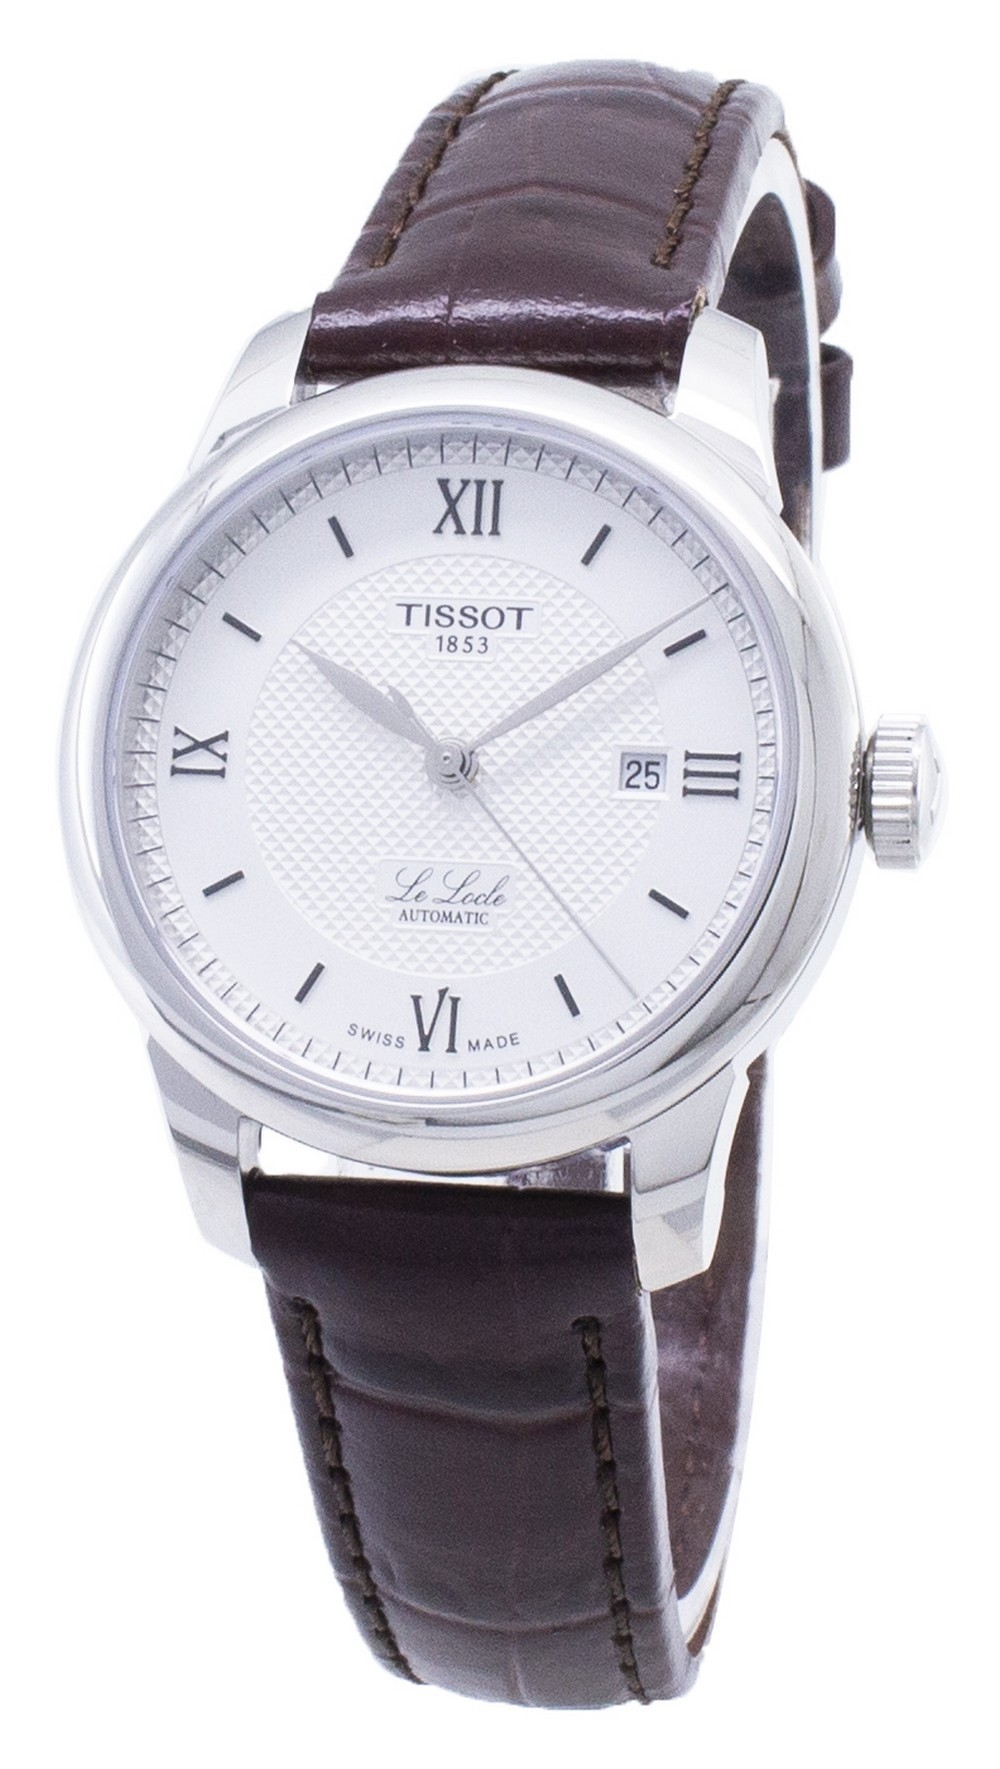 TISSOT Specialities Classic